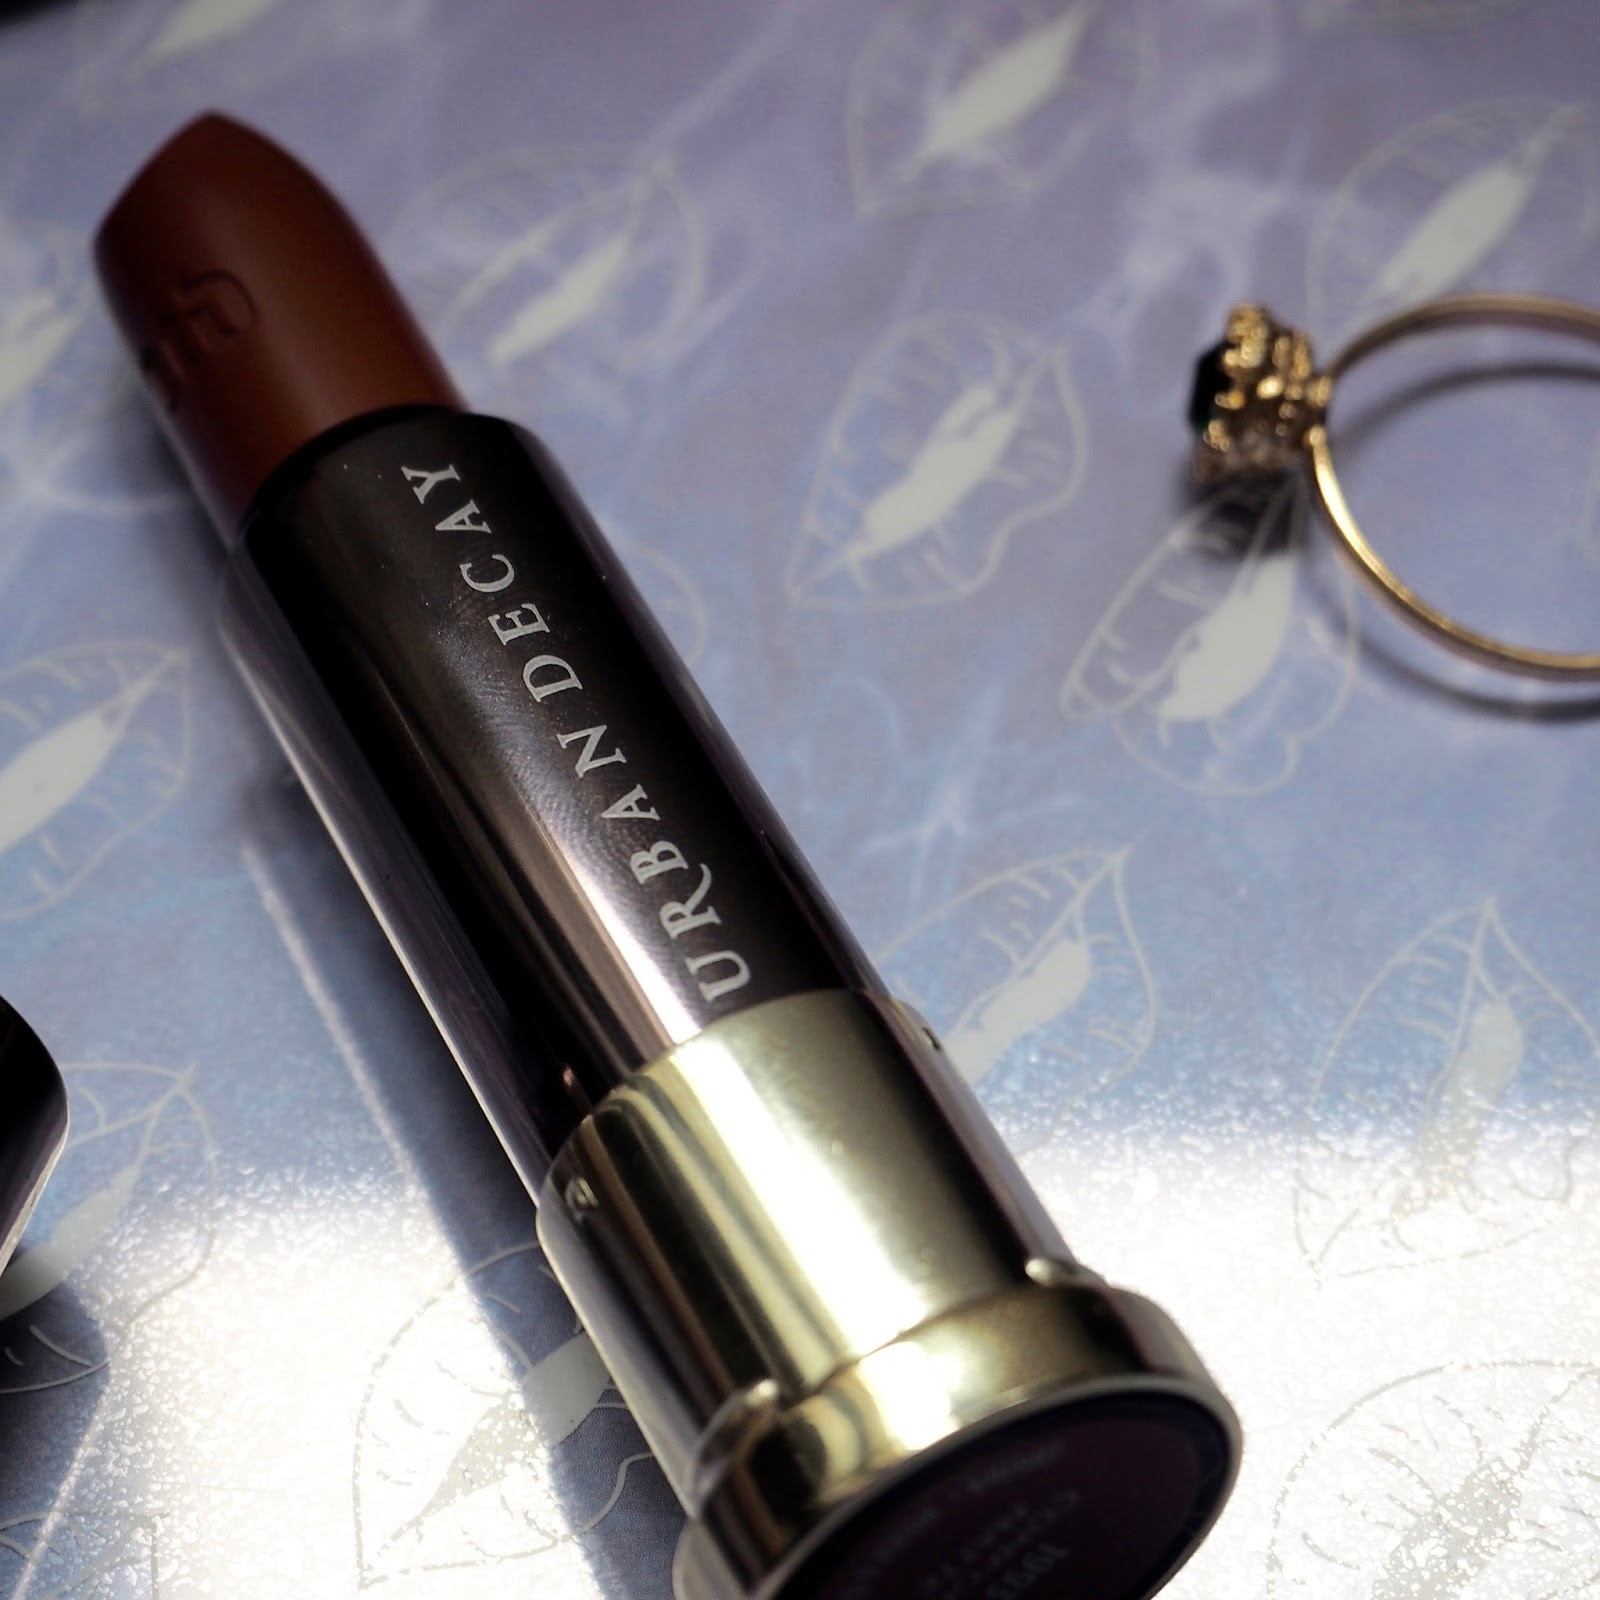 Urban Decay Vice Lipstick Shade 1993 Comfort Matte